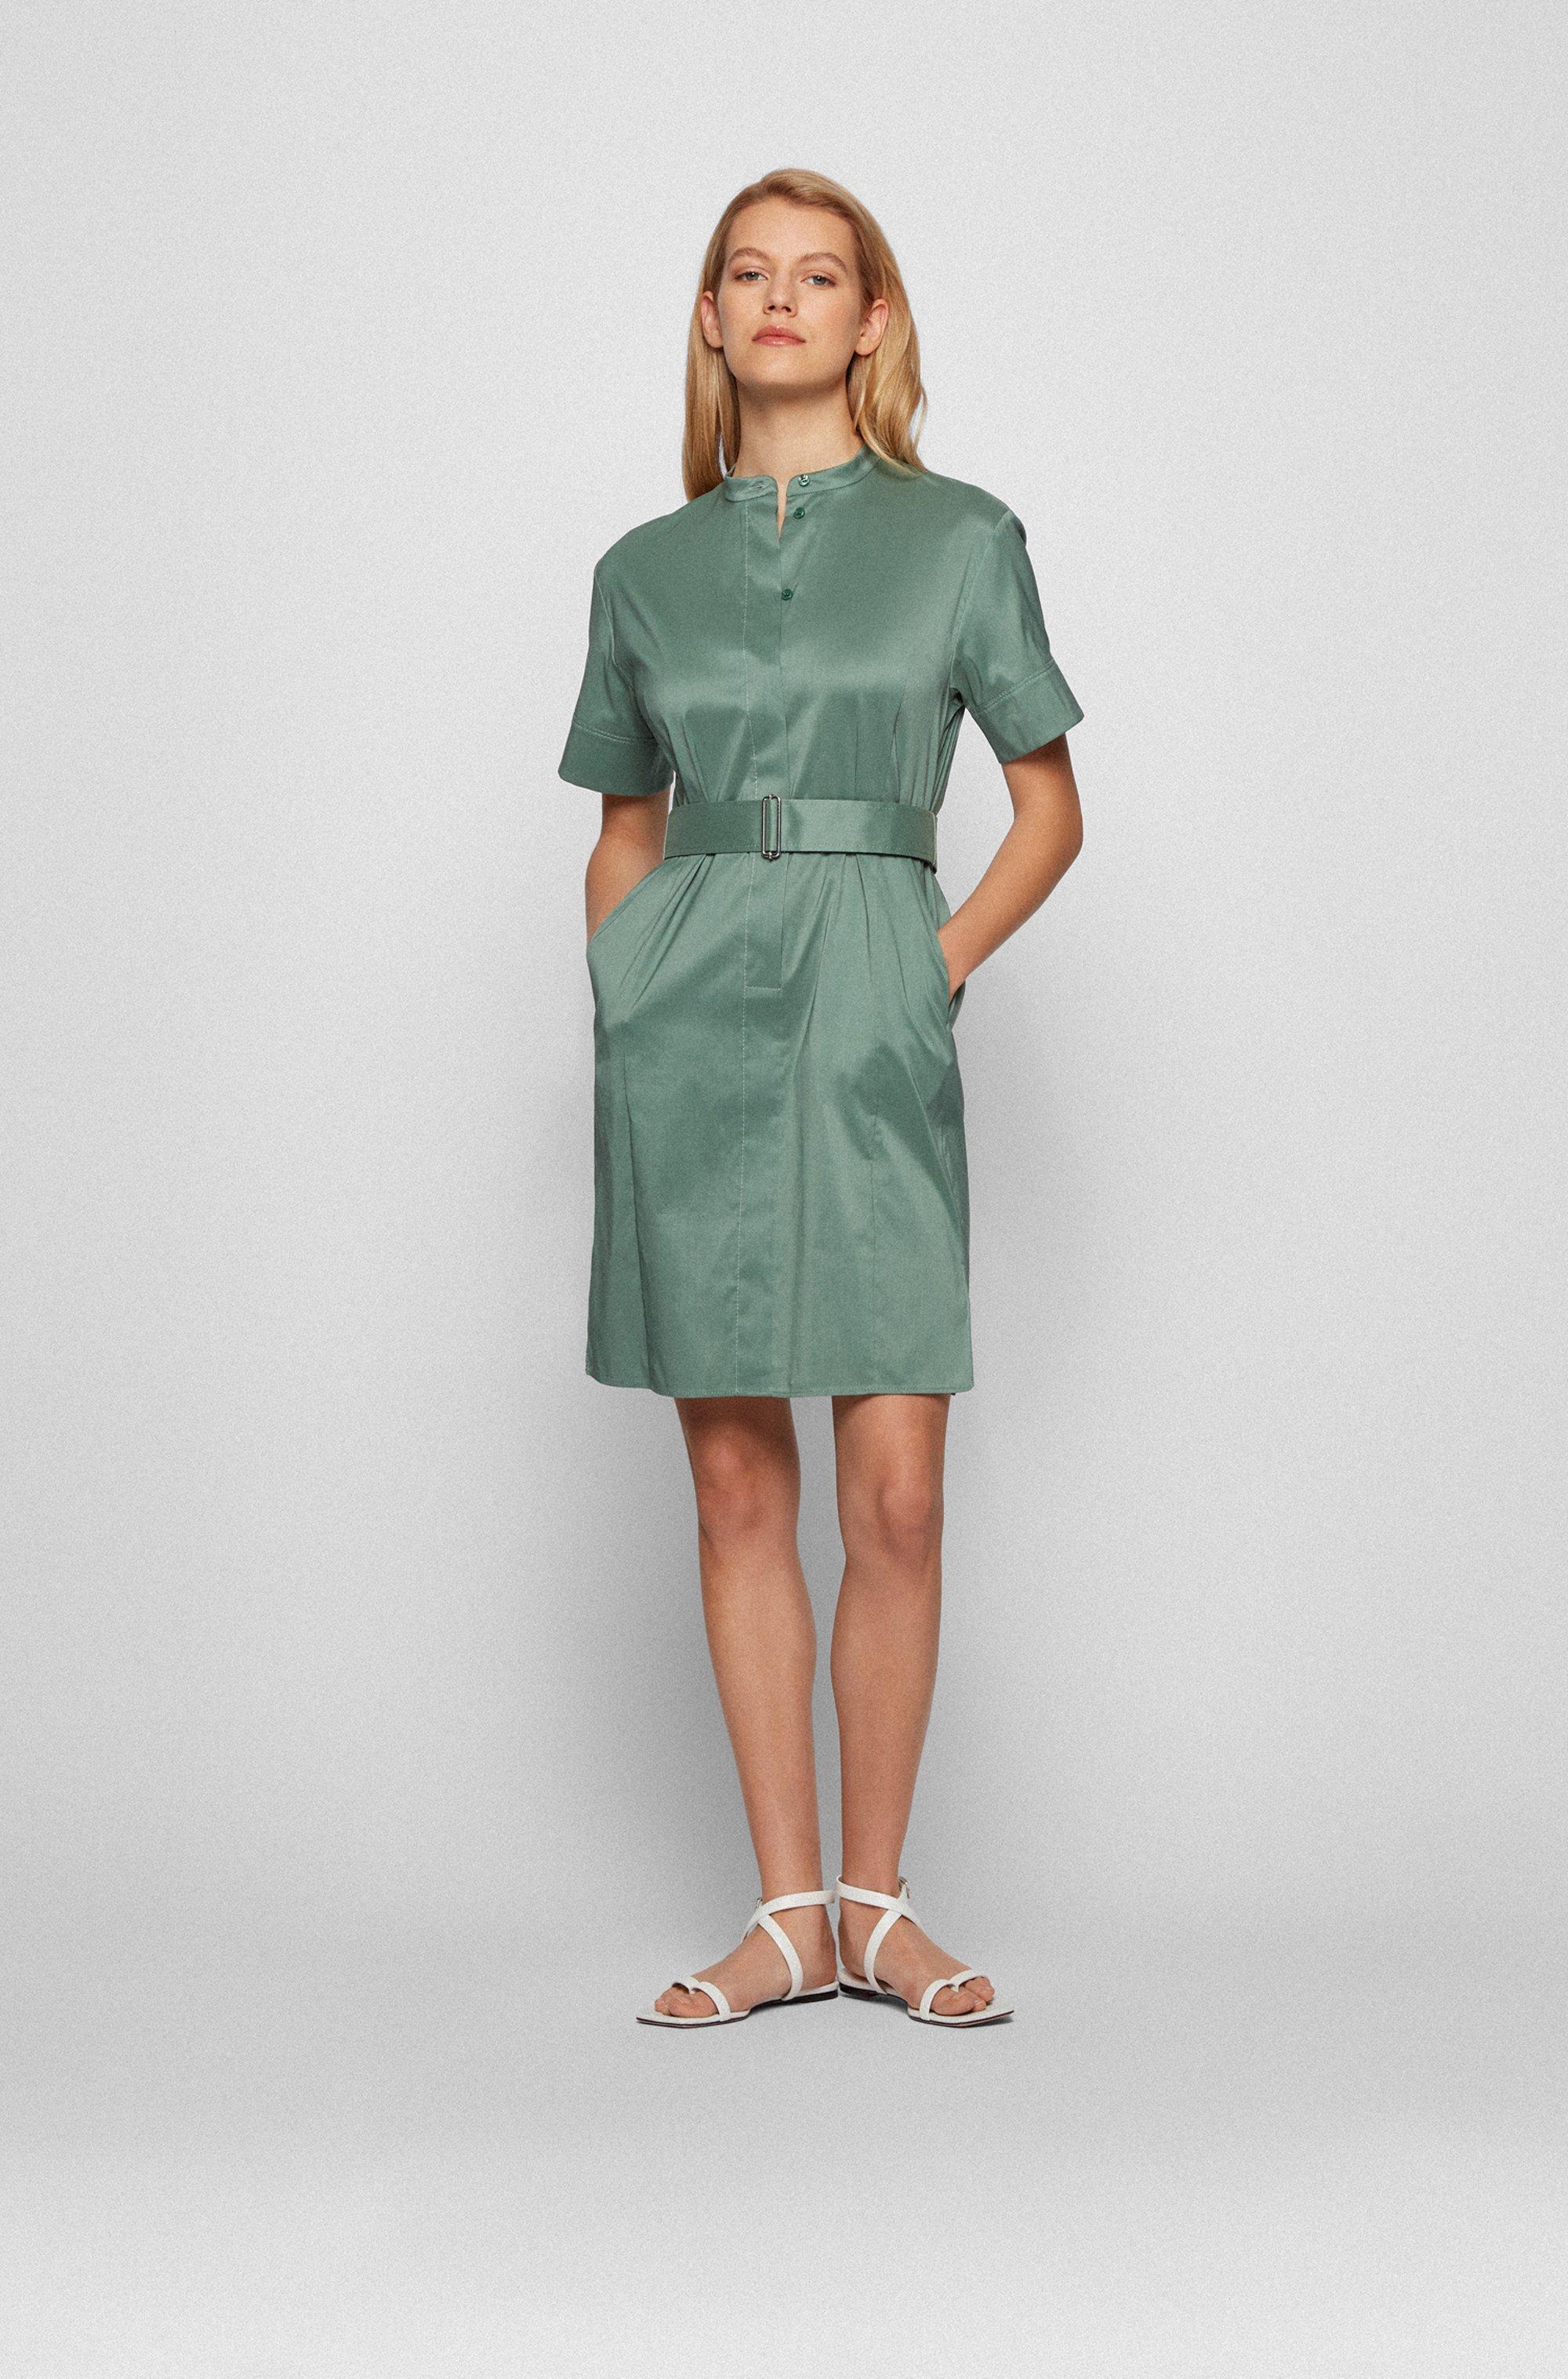 Short-sleeved shirt dress in lightweight stretch poplin